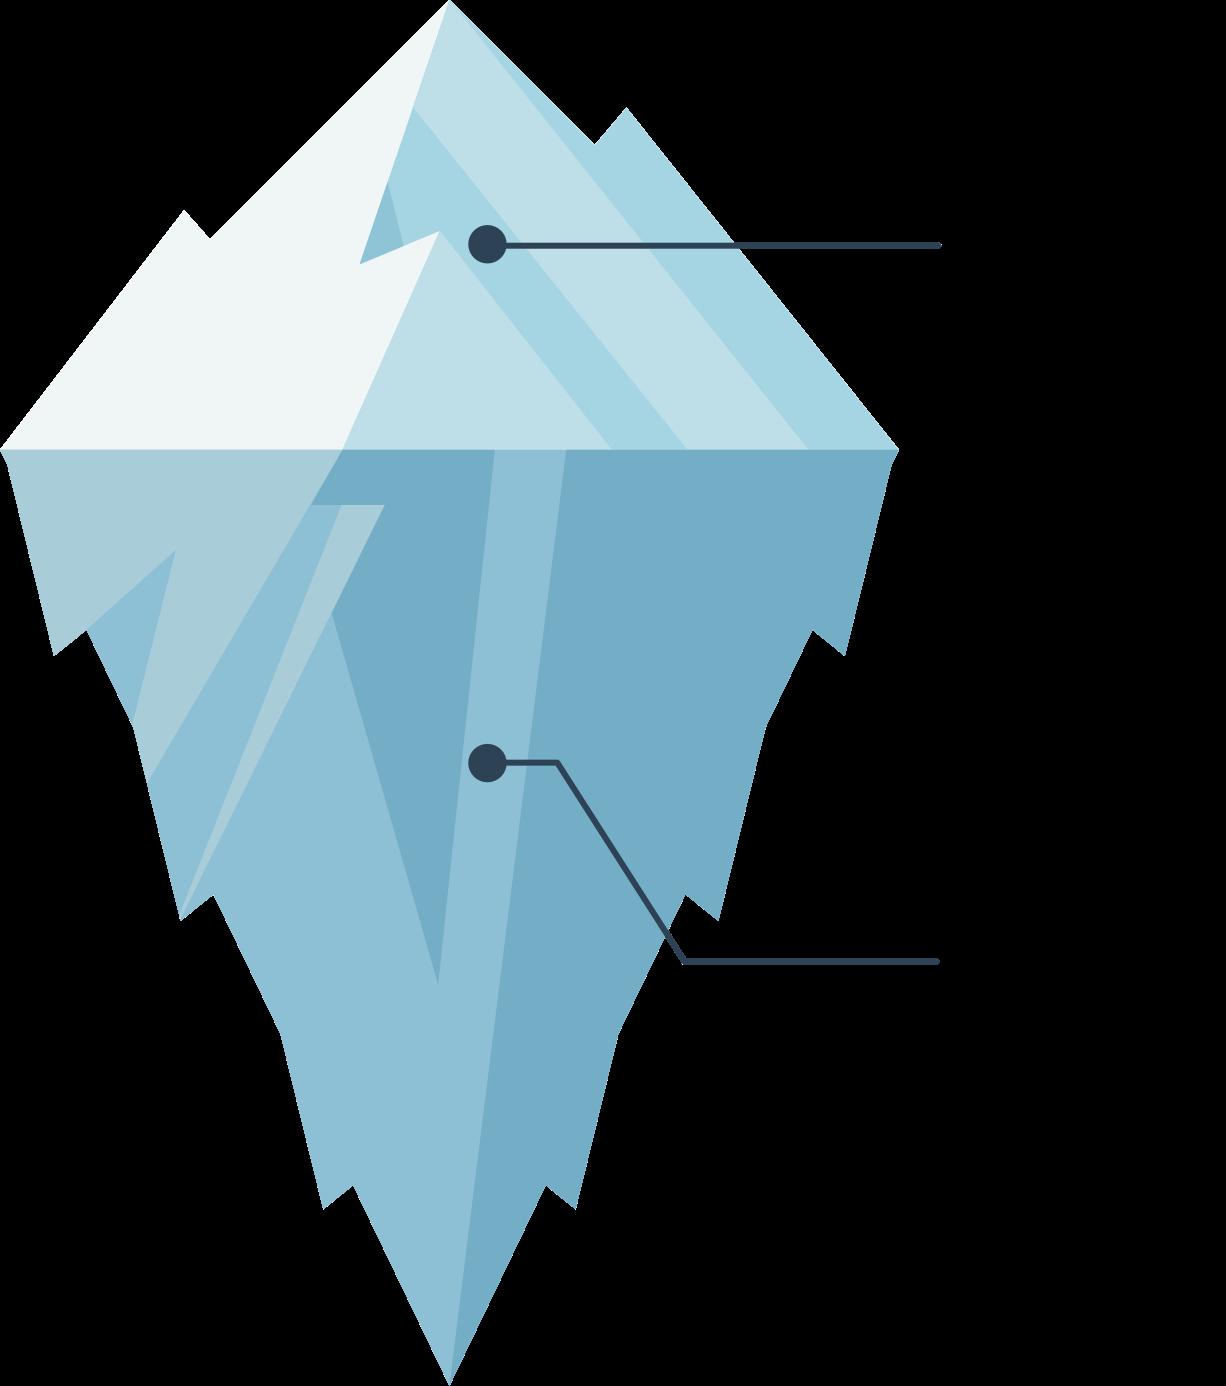 The Advantic Iceberg